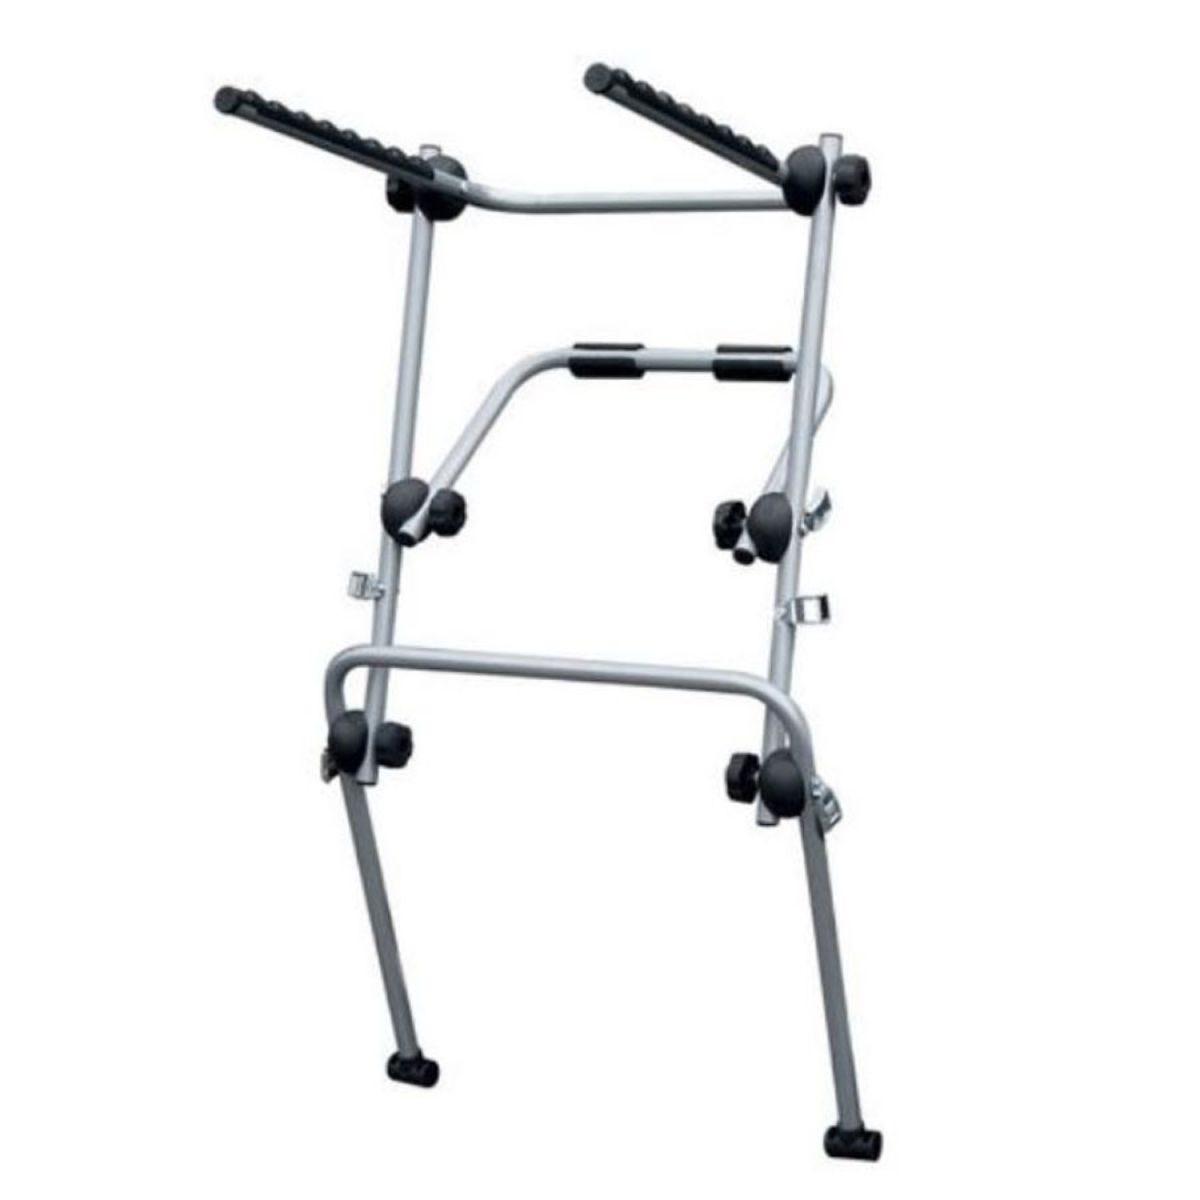 Menabo Main High Rise Rear-Mounted Bike Rack for 3 Bikes – Silver